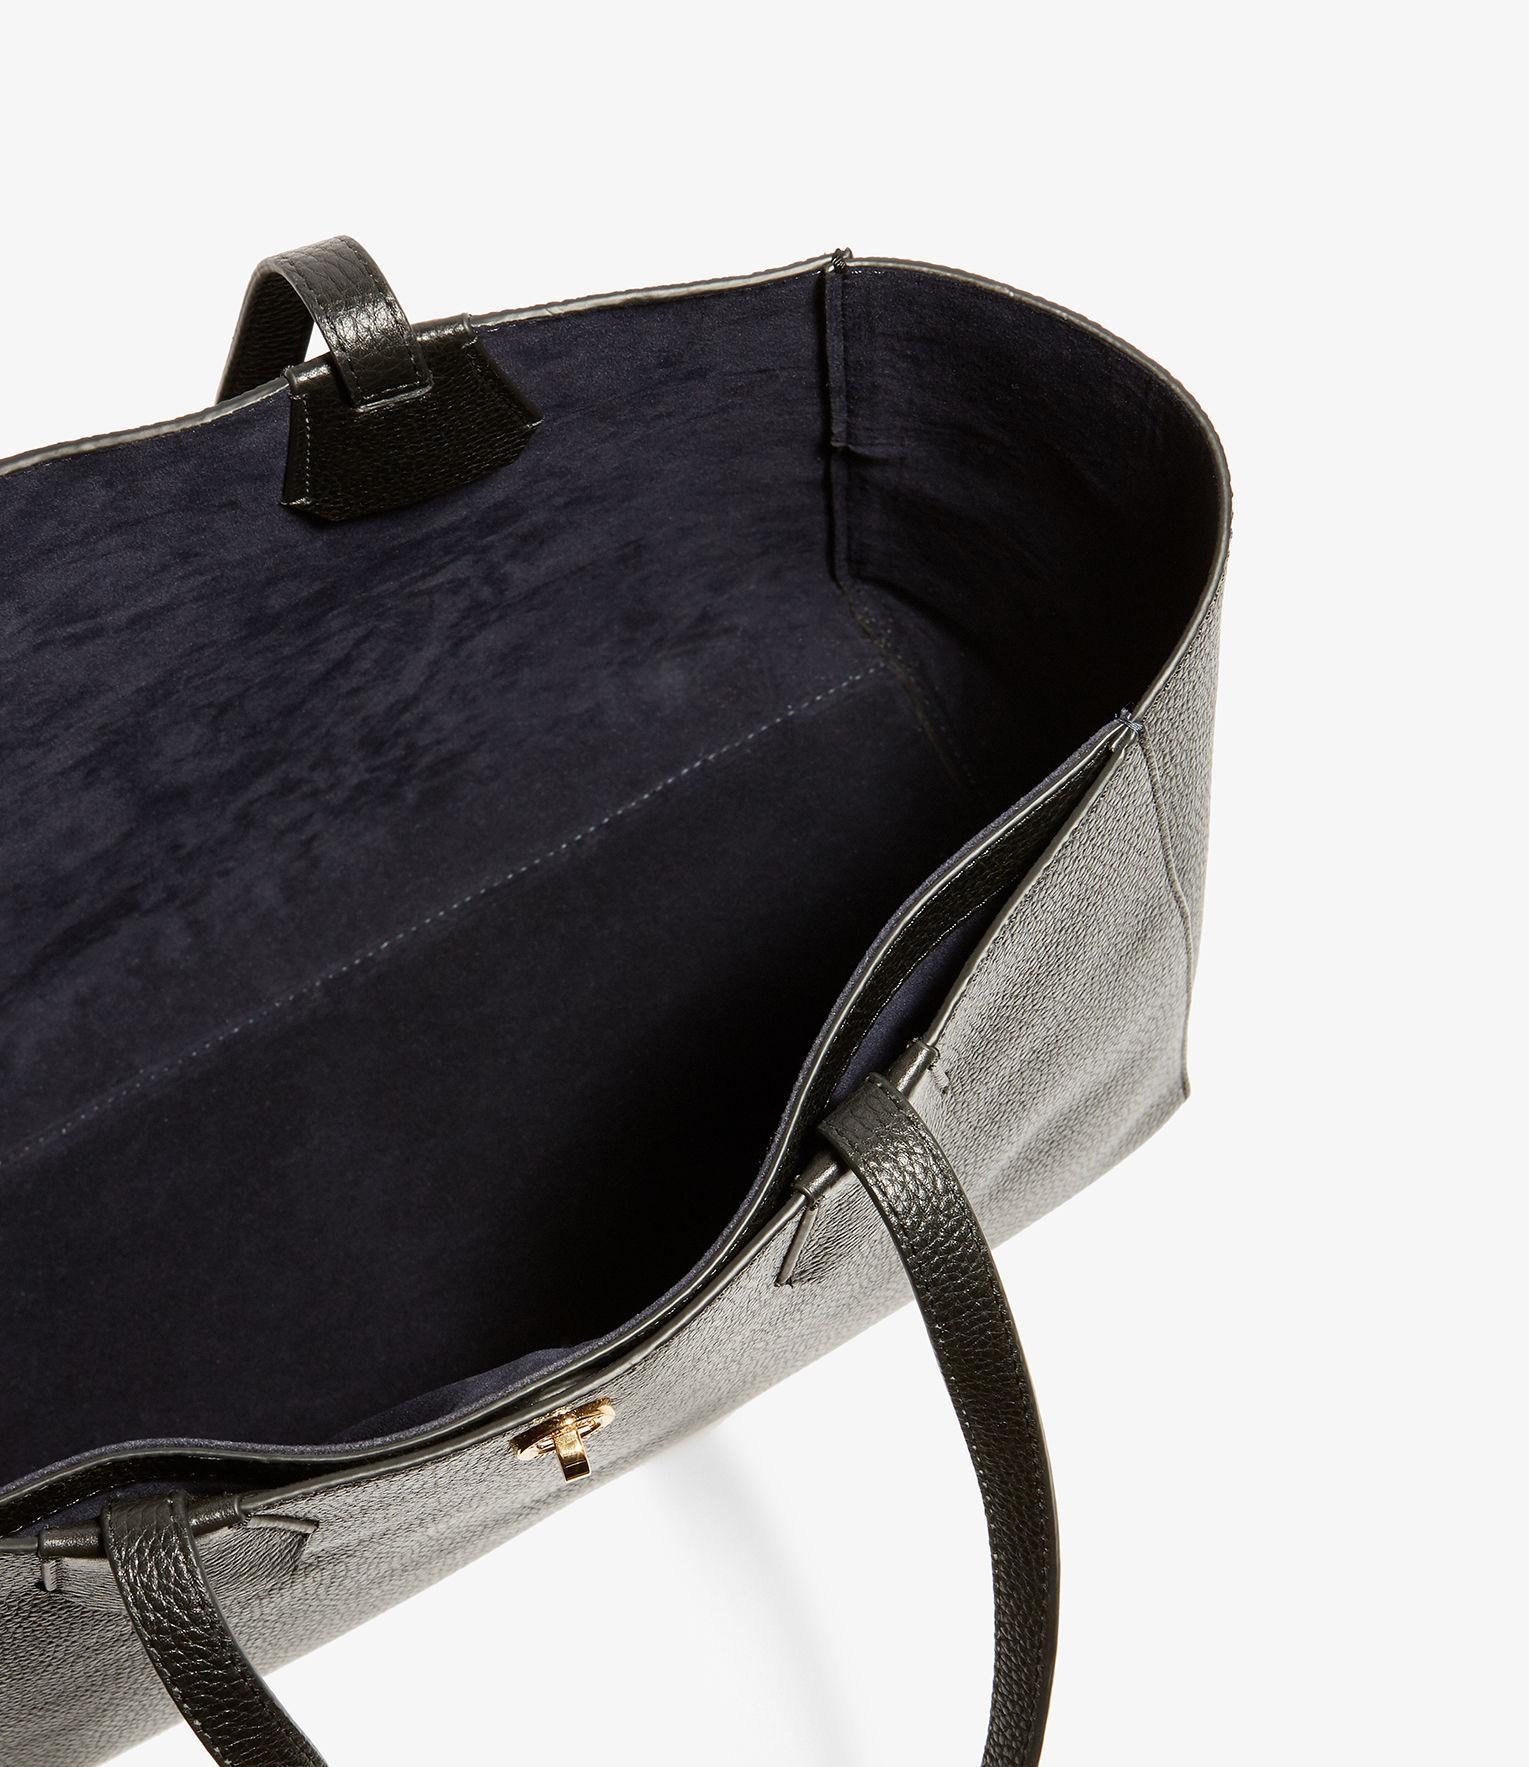 Karen Millen Leather East West Tote Bag in Black